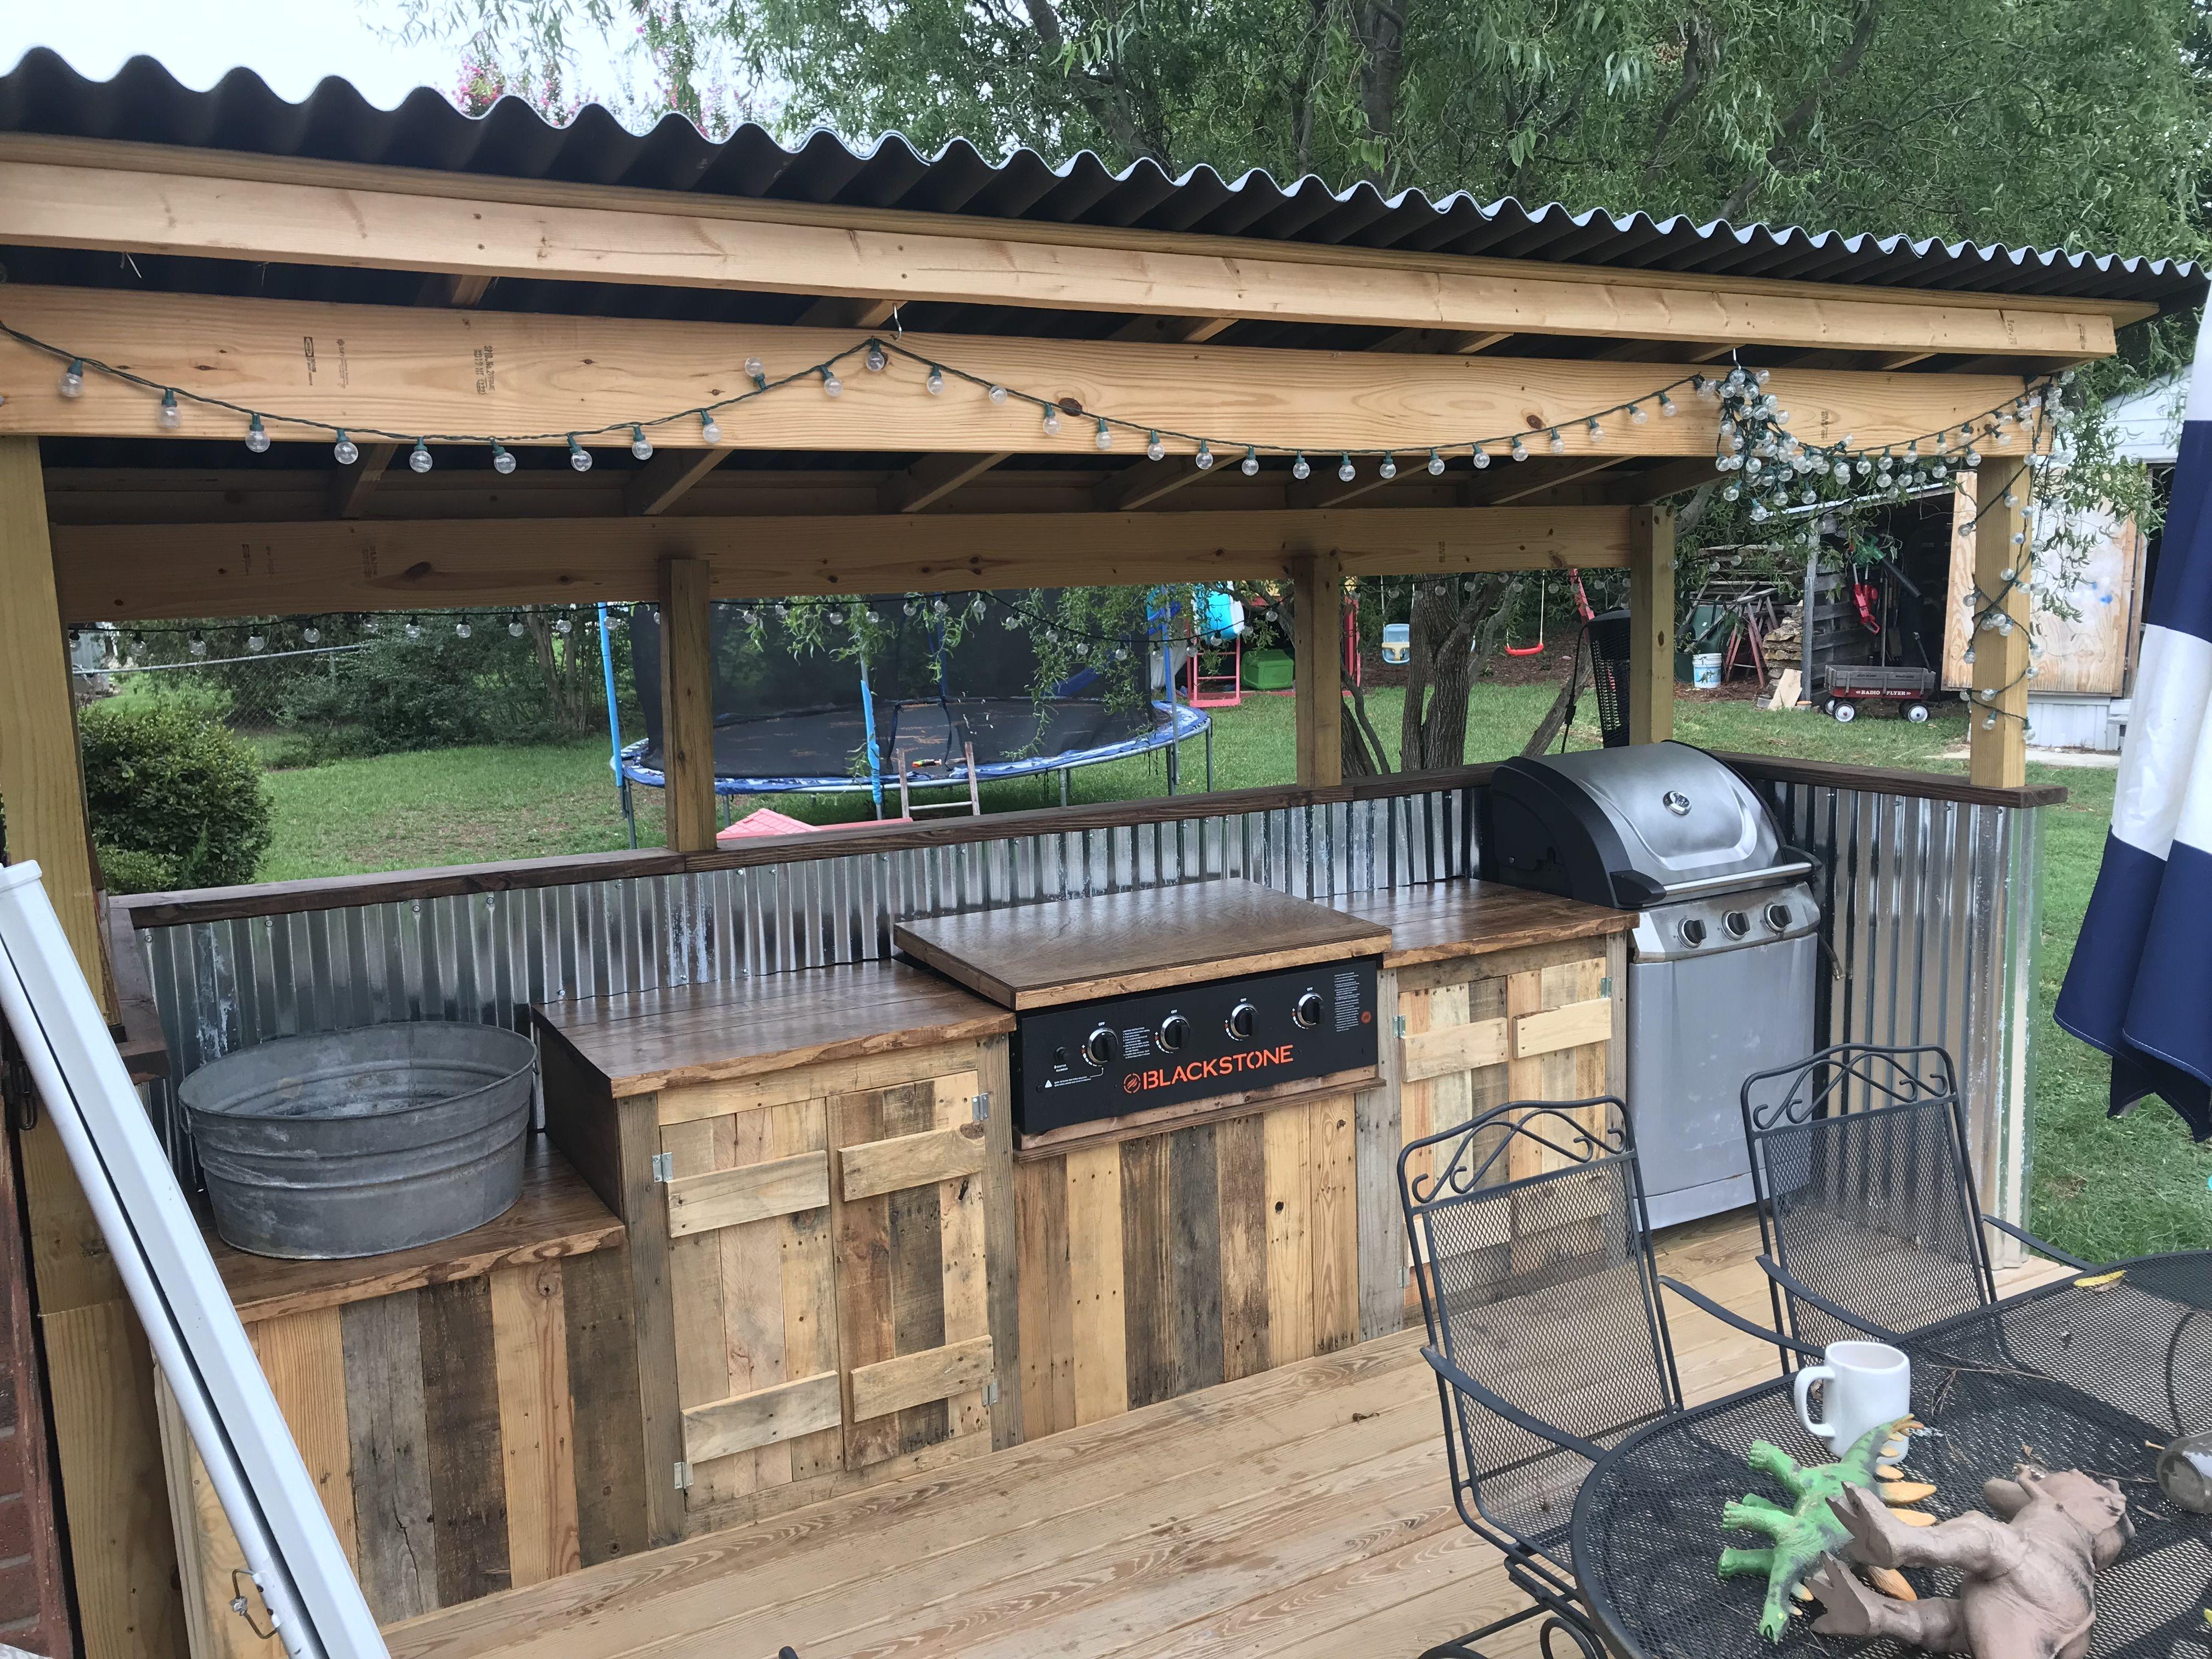 Outdoor Kitchen Ideas Outdoor Kitchen Patio Rustic Outdoor Kitchens Outdoor Grill Station